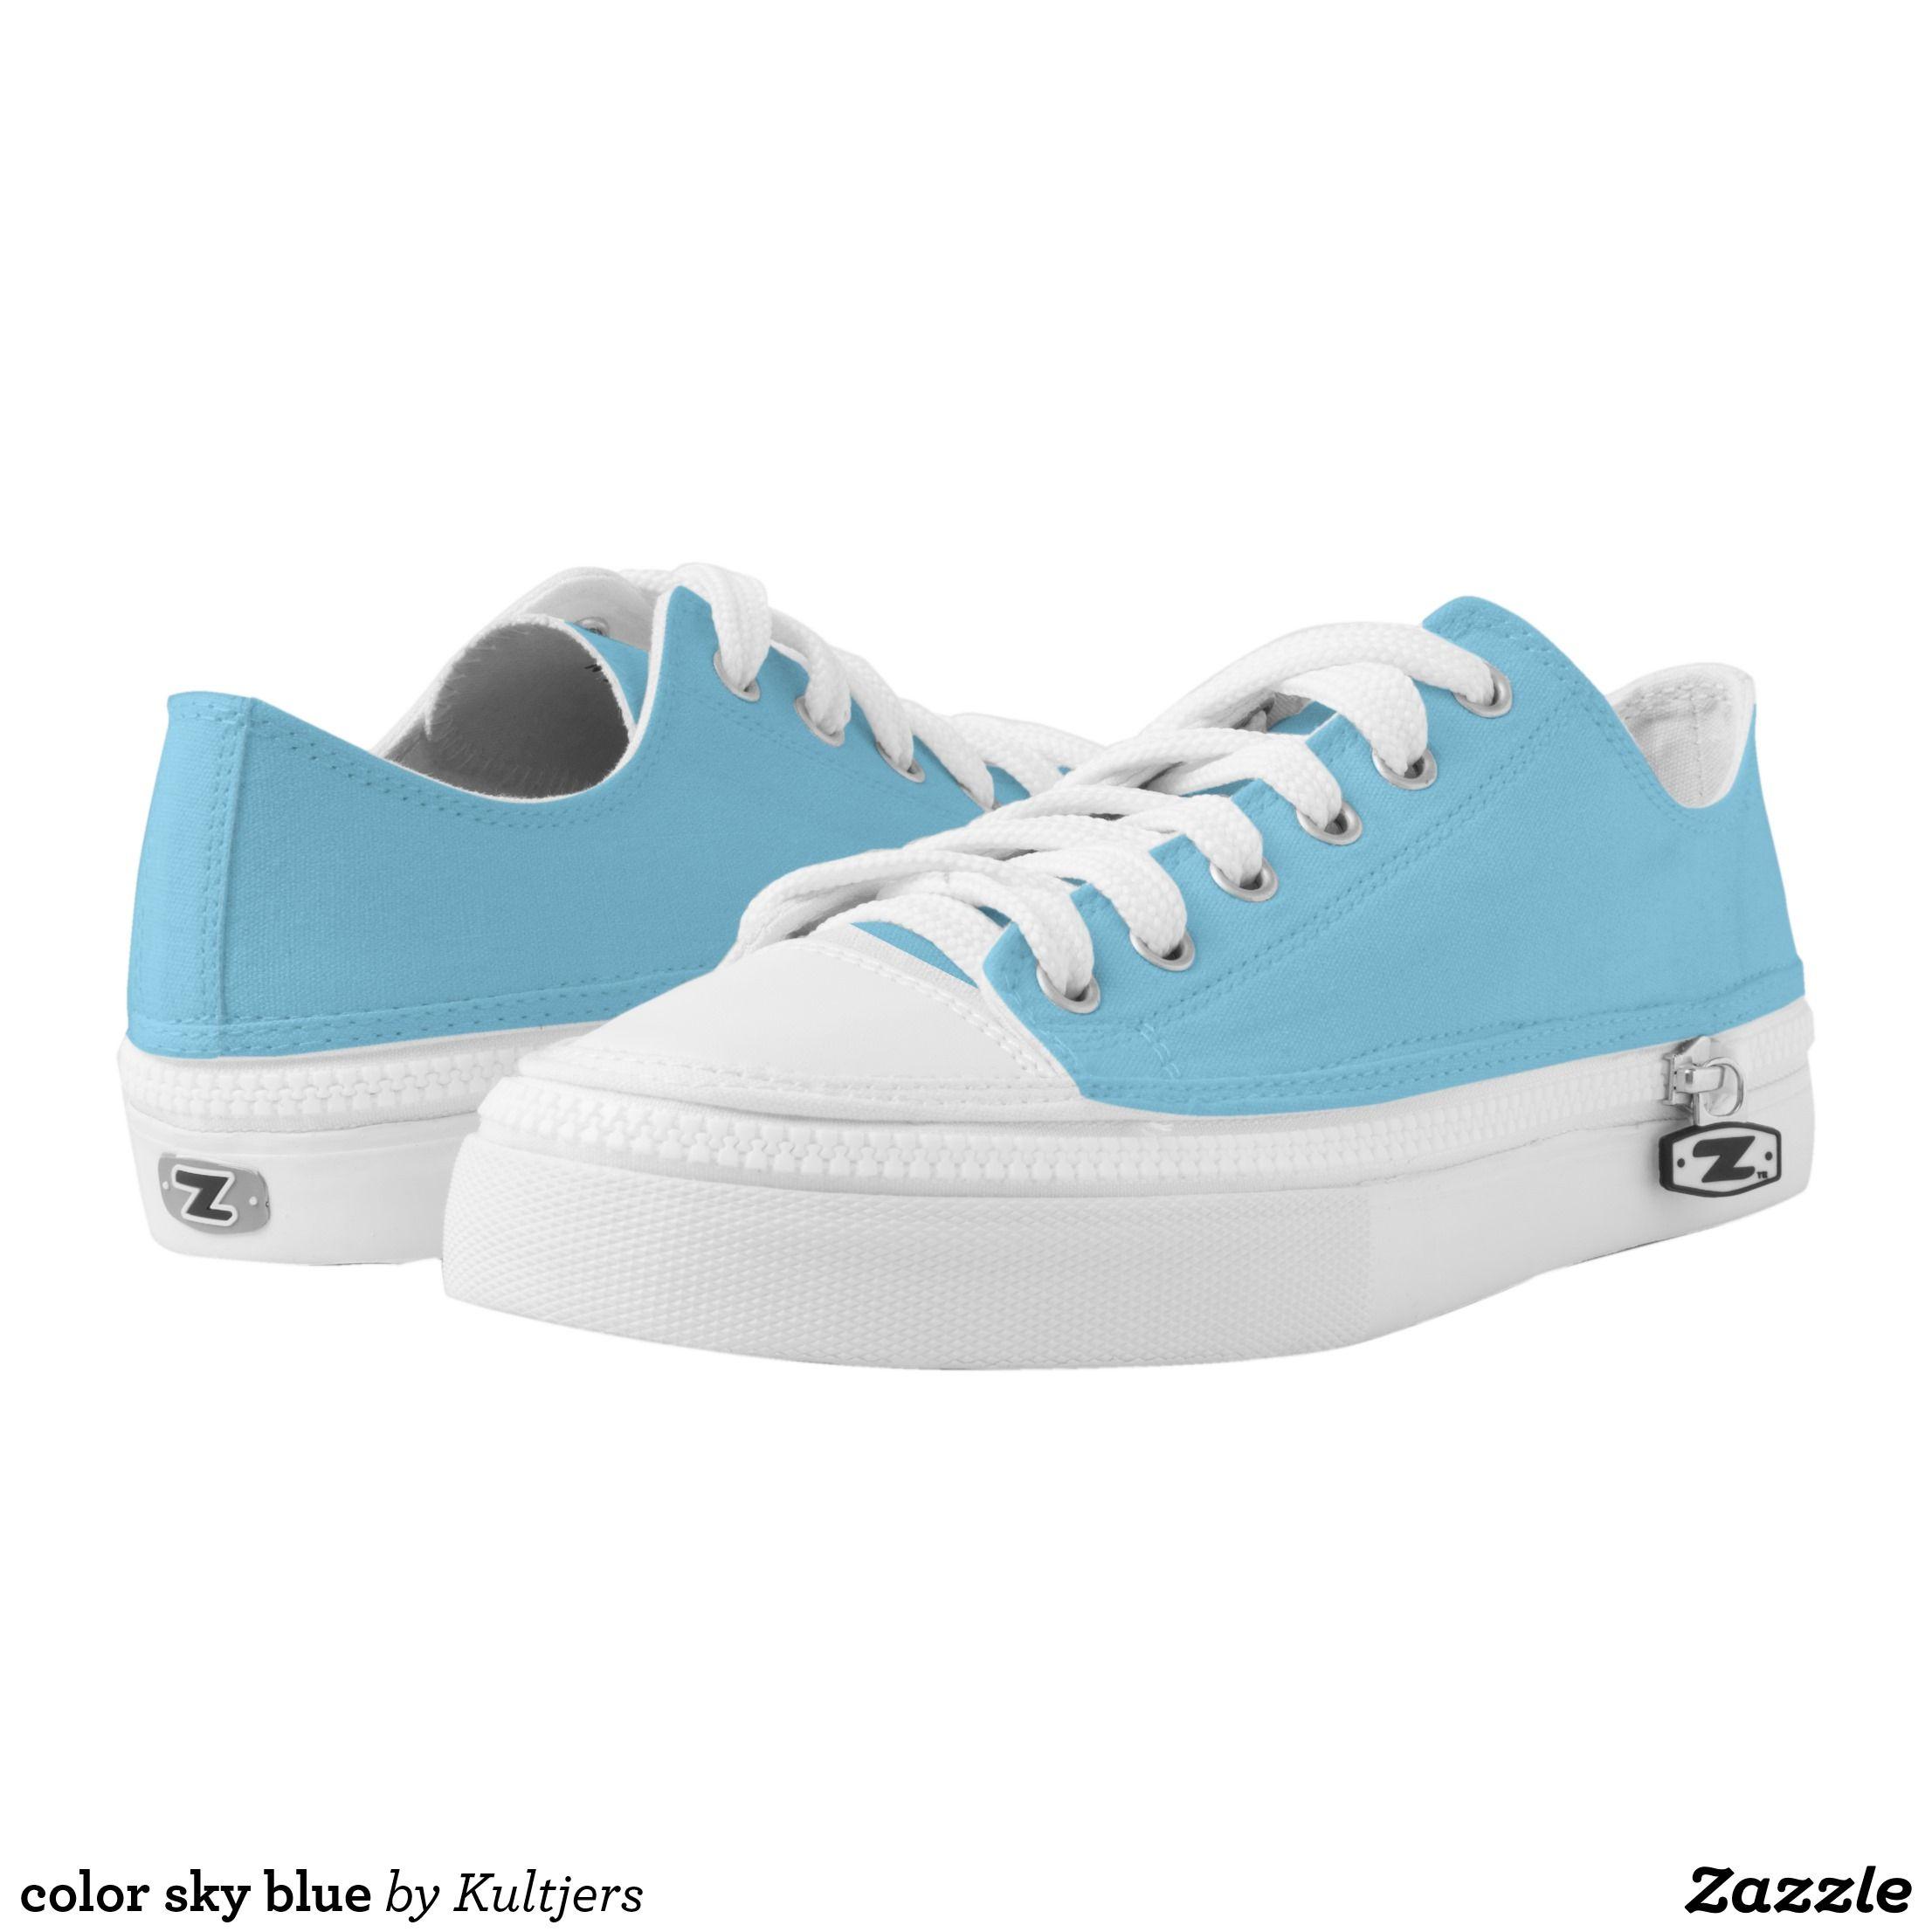 color sky blue Low-Top sneakers